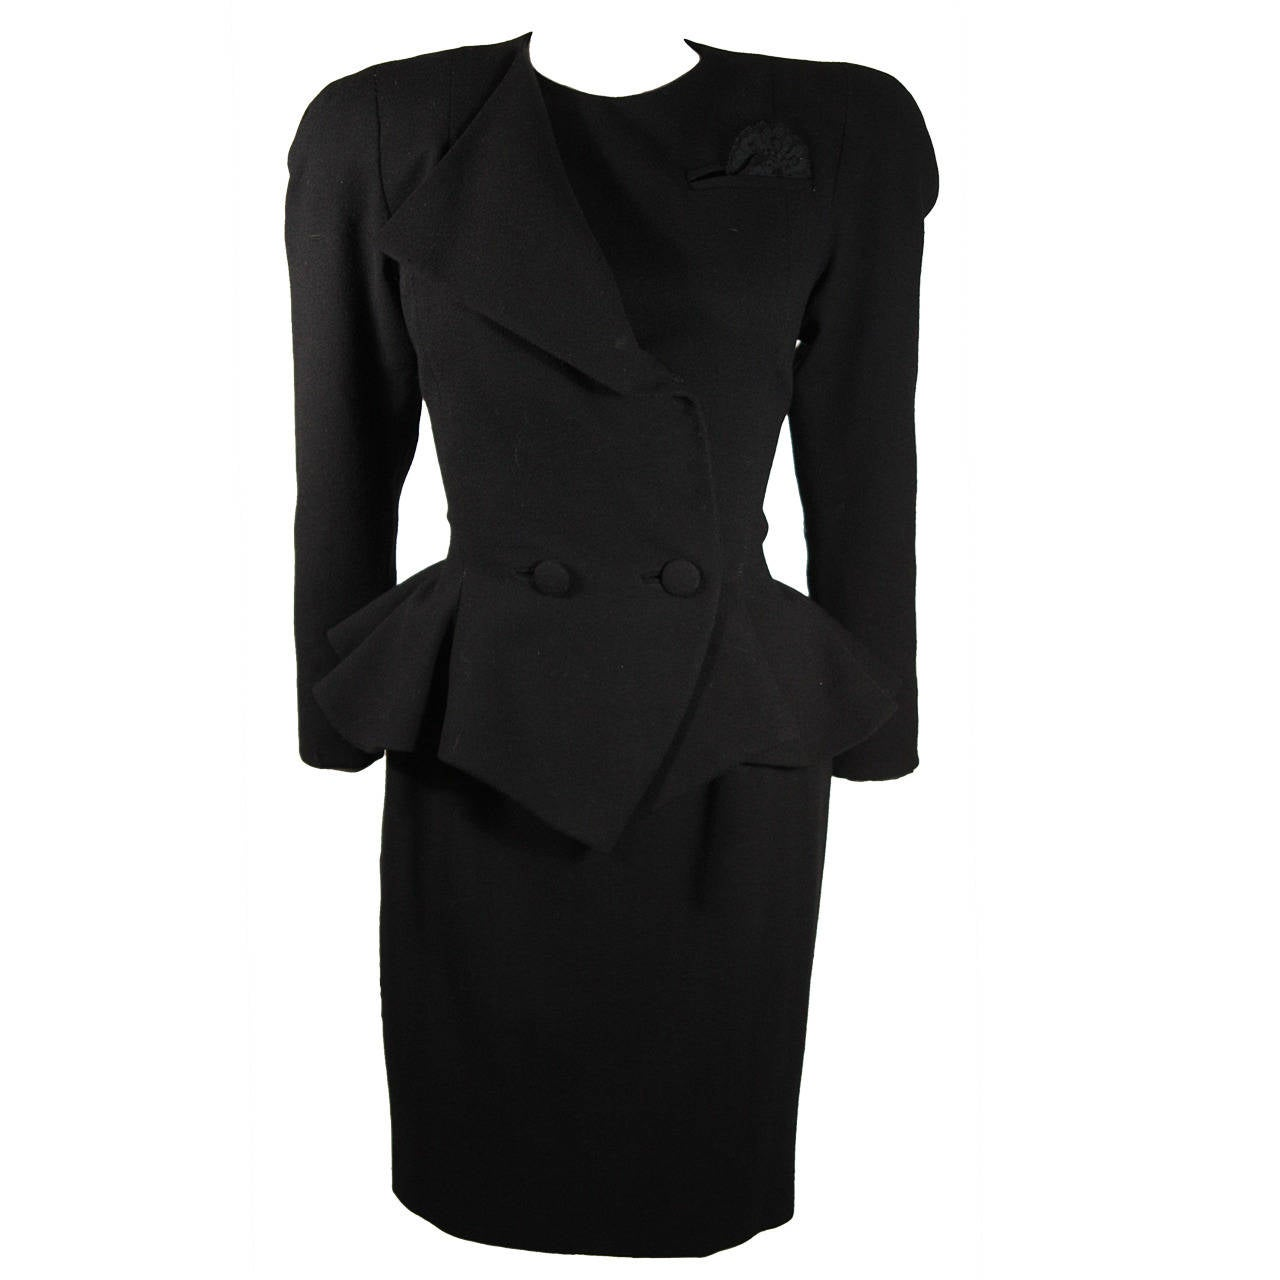 Travilla Black Structured Skirt Suit Size 8